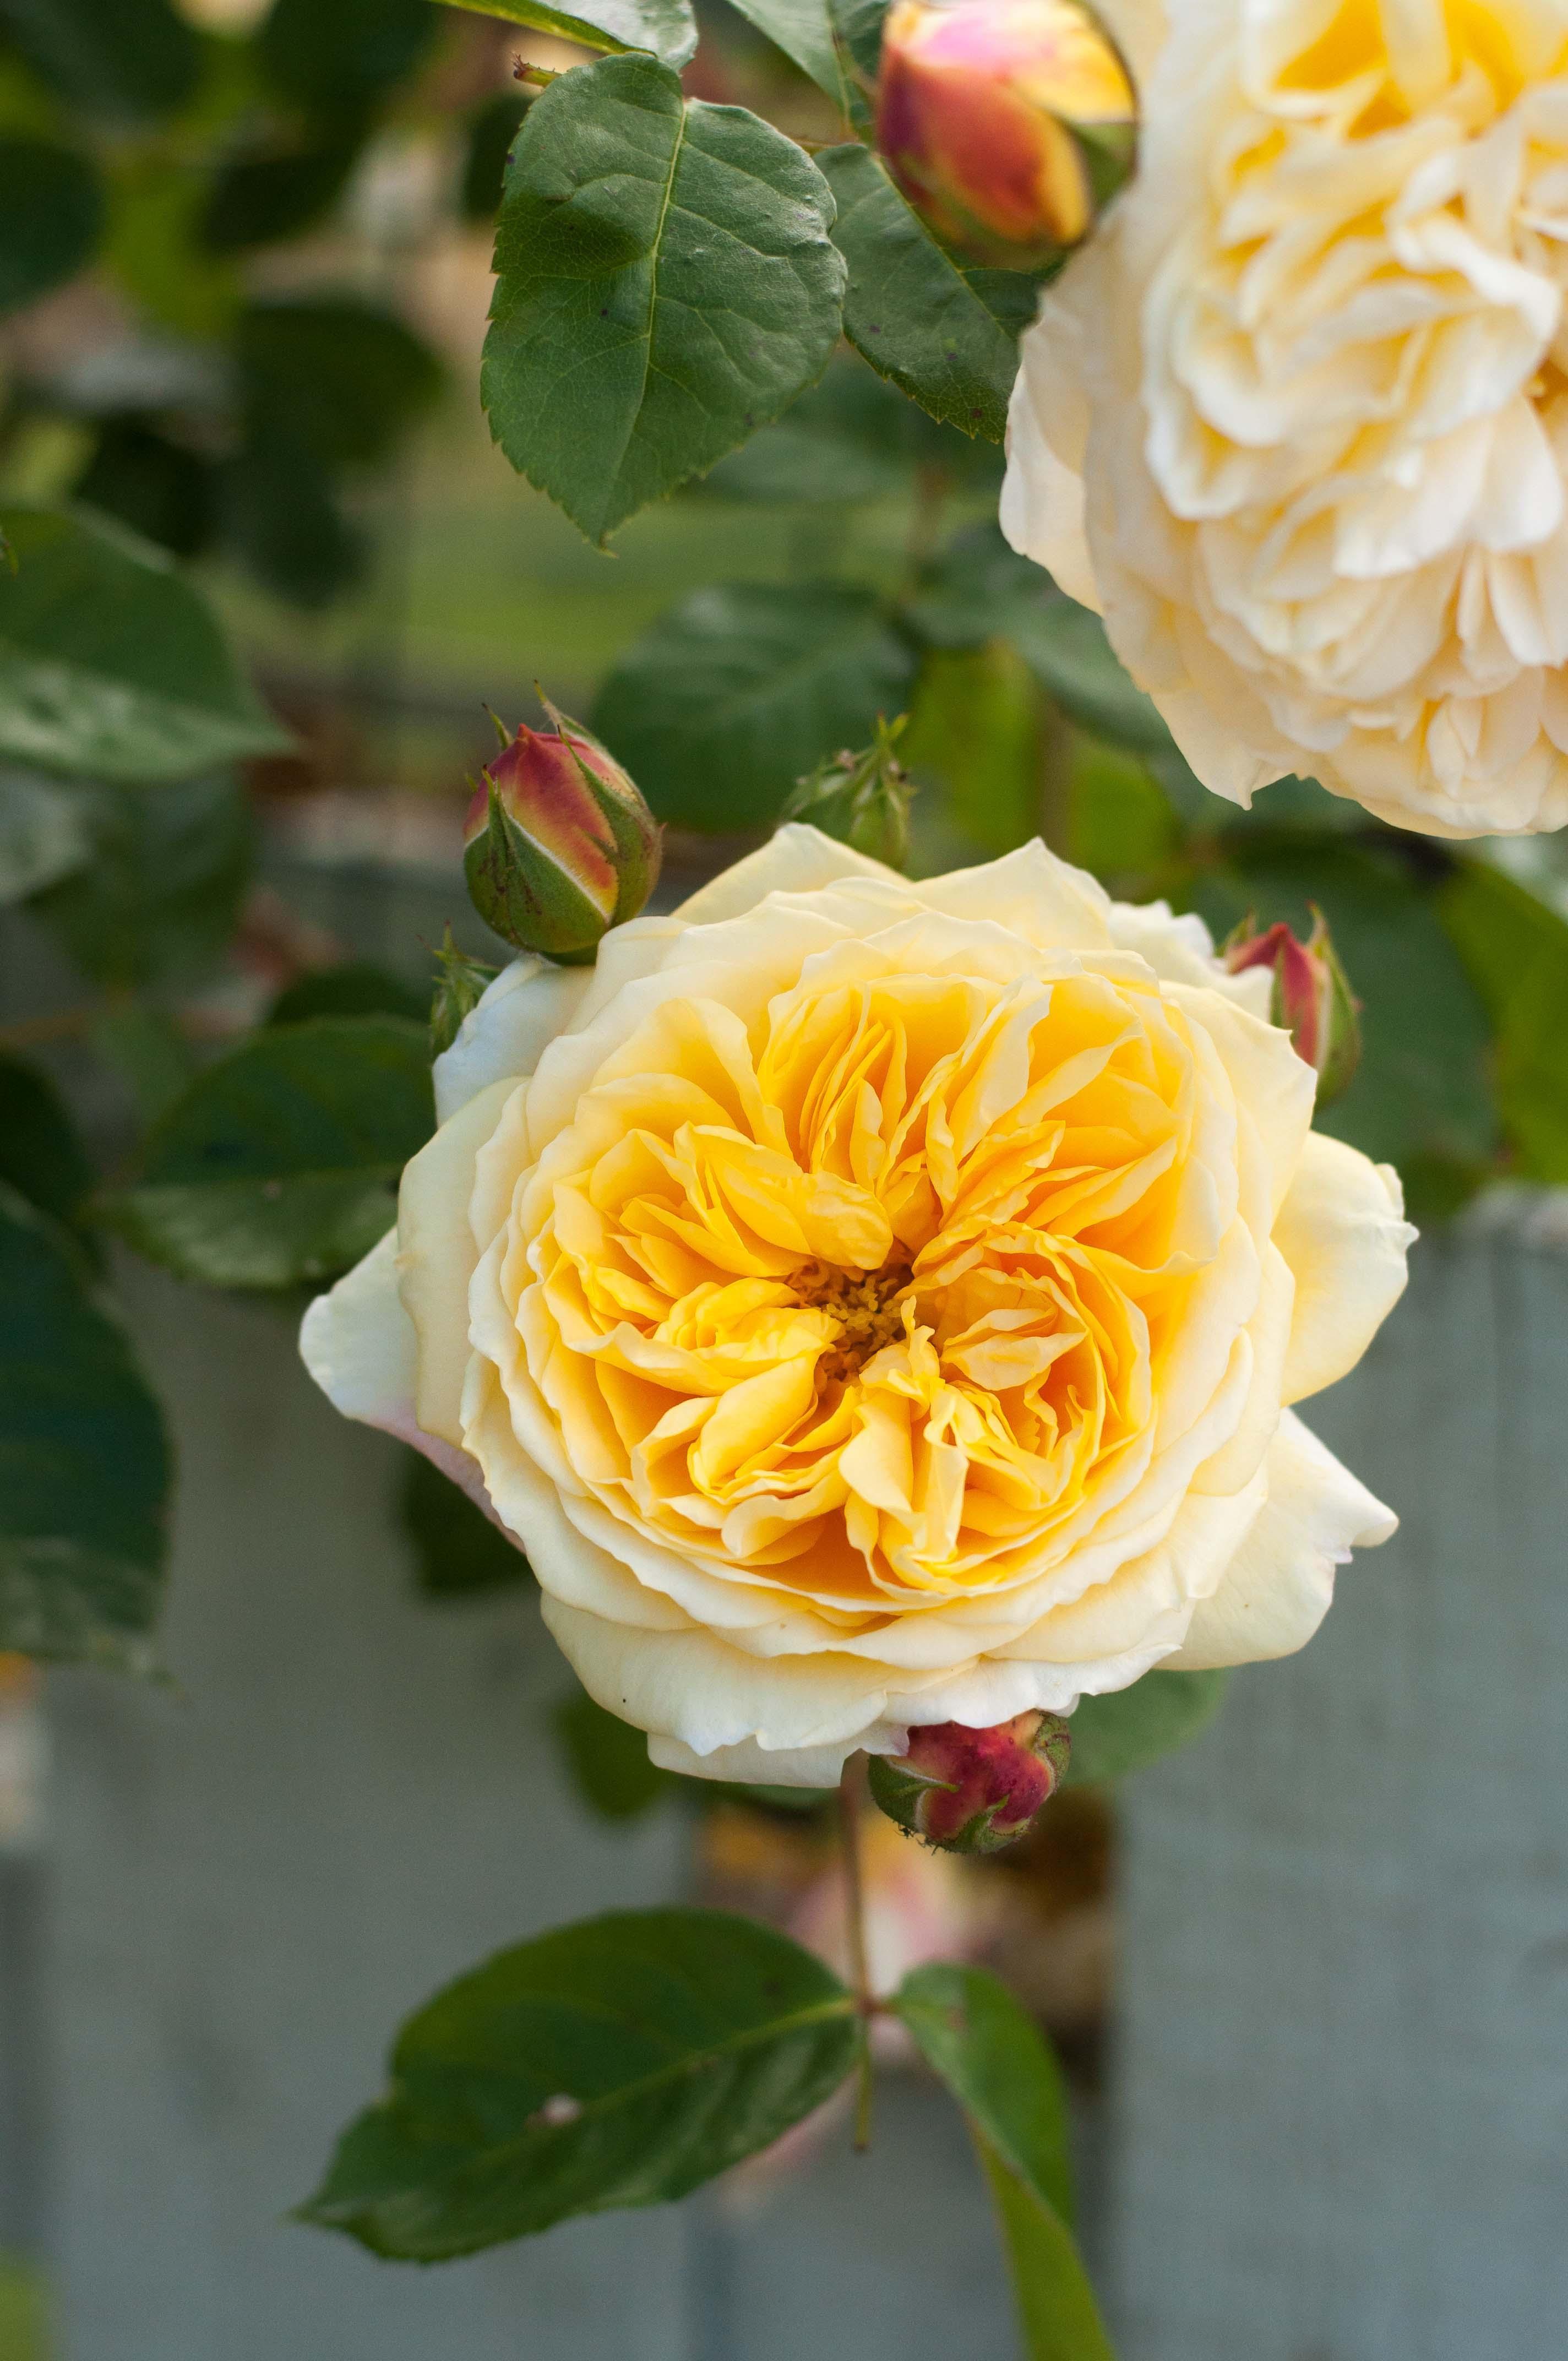 rose-teasing-georgia-2